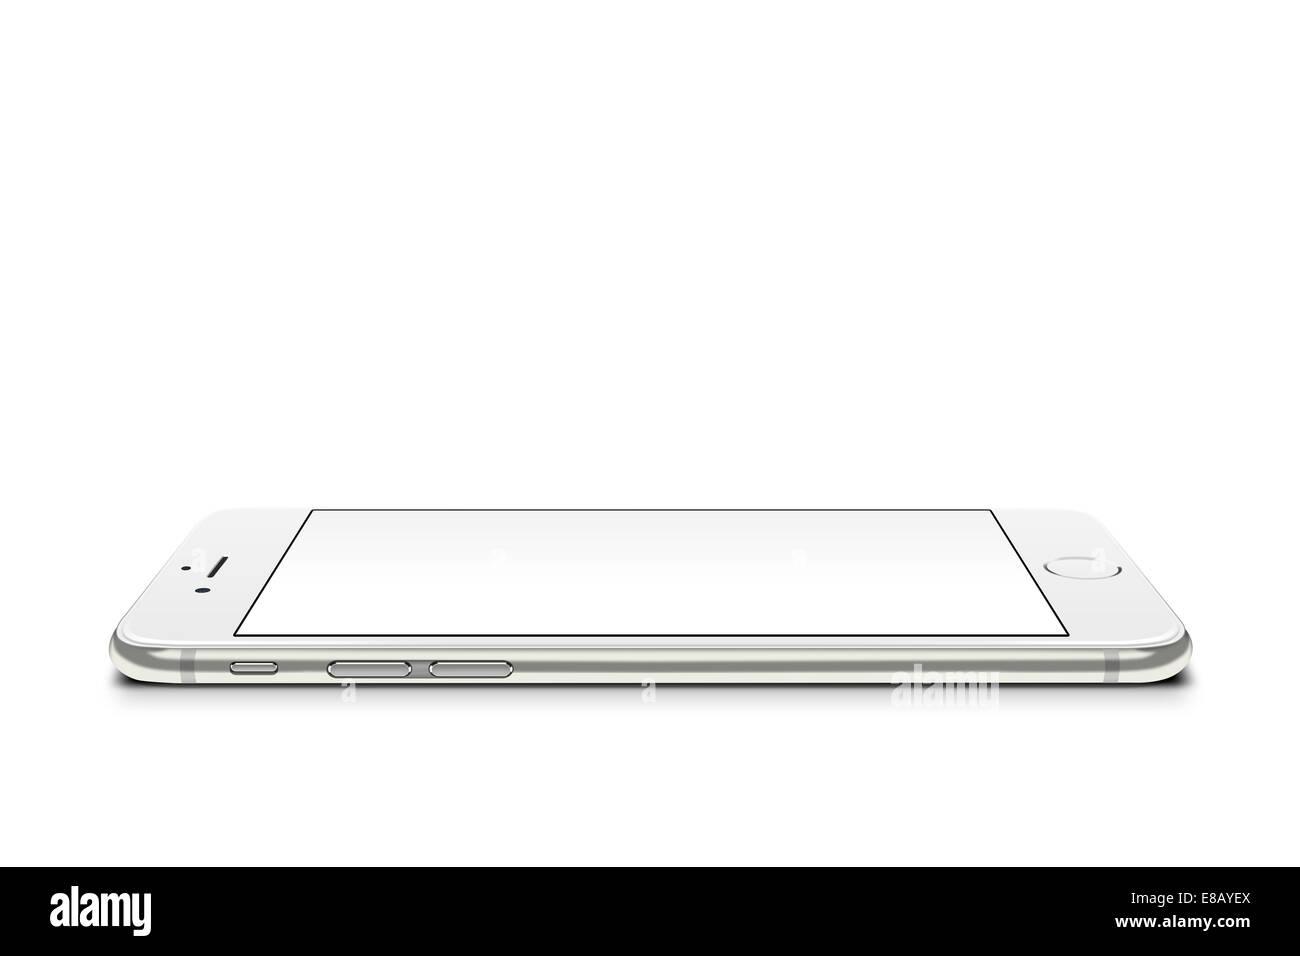 Smartphone iphone 6 silver, digitally generated artwork. - Stock Image